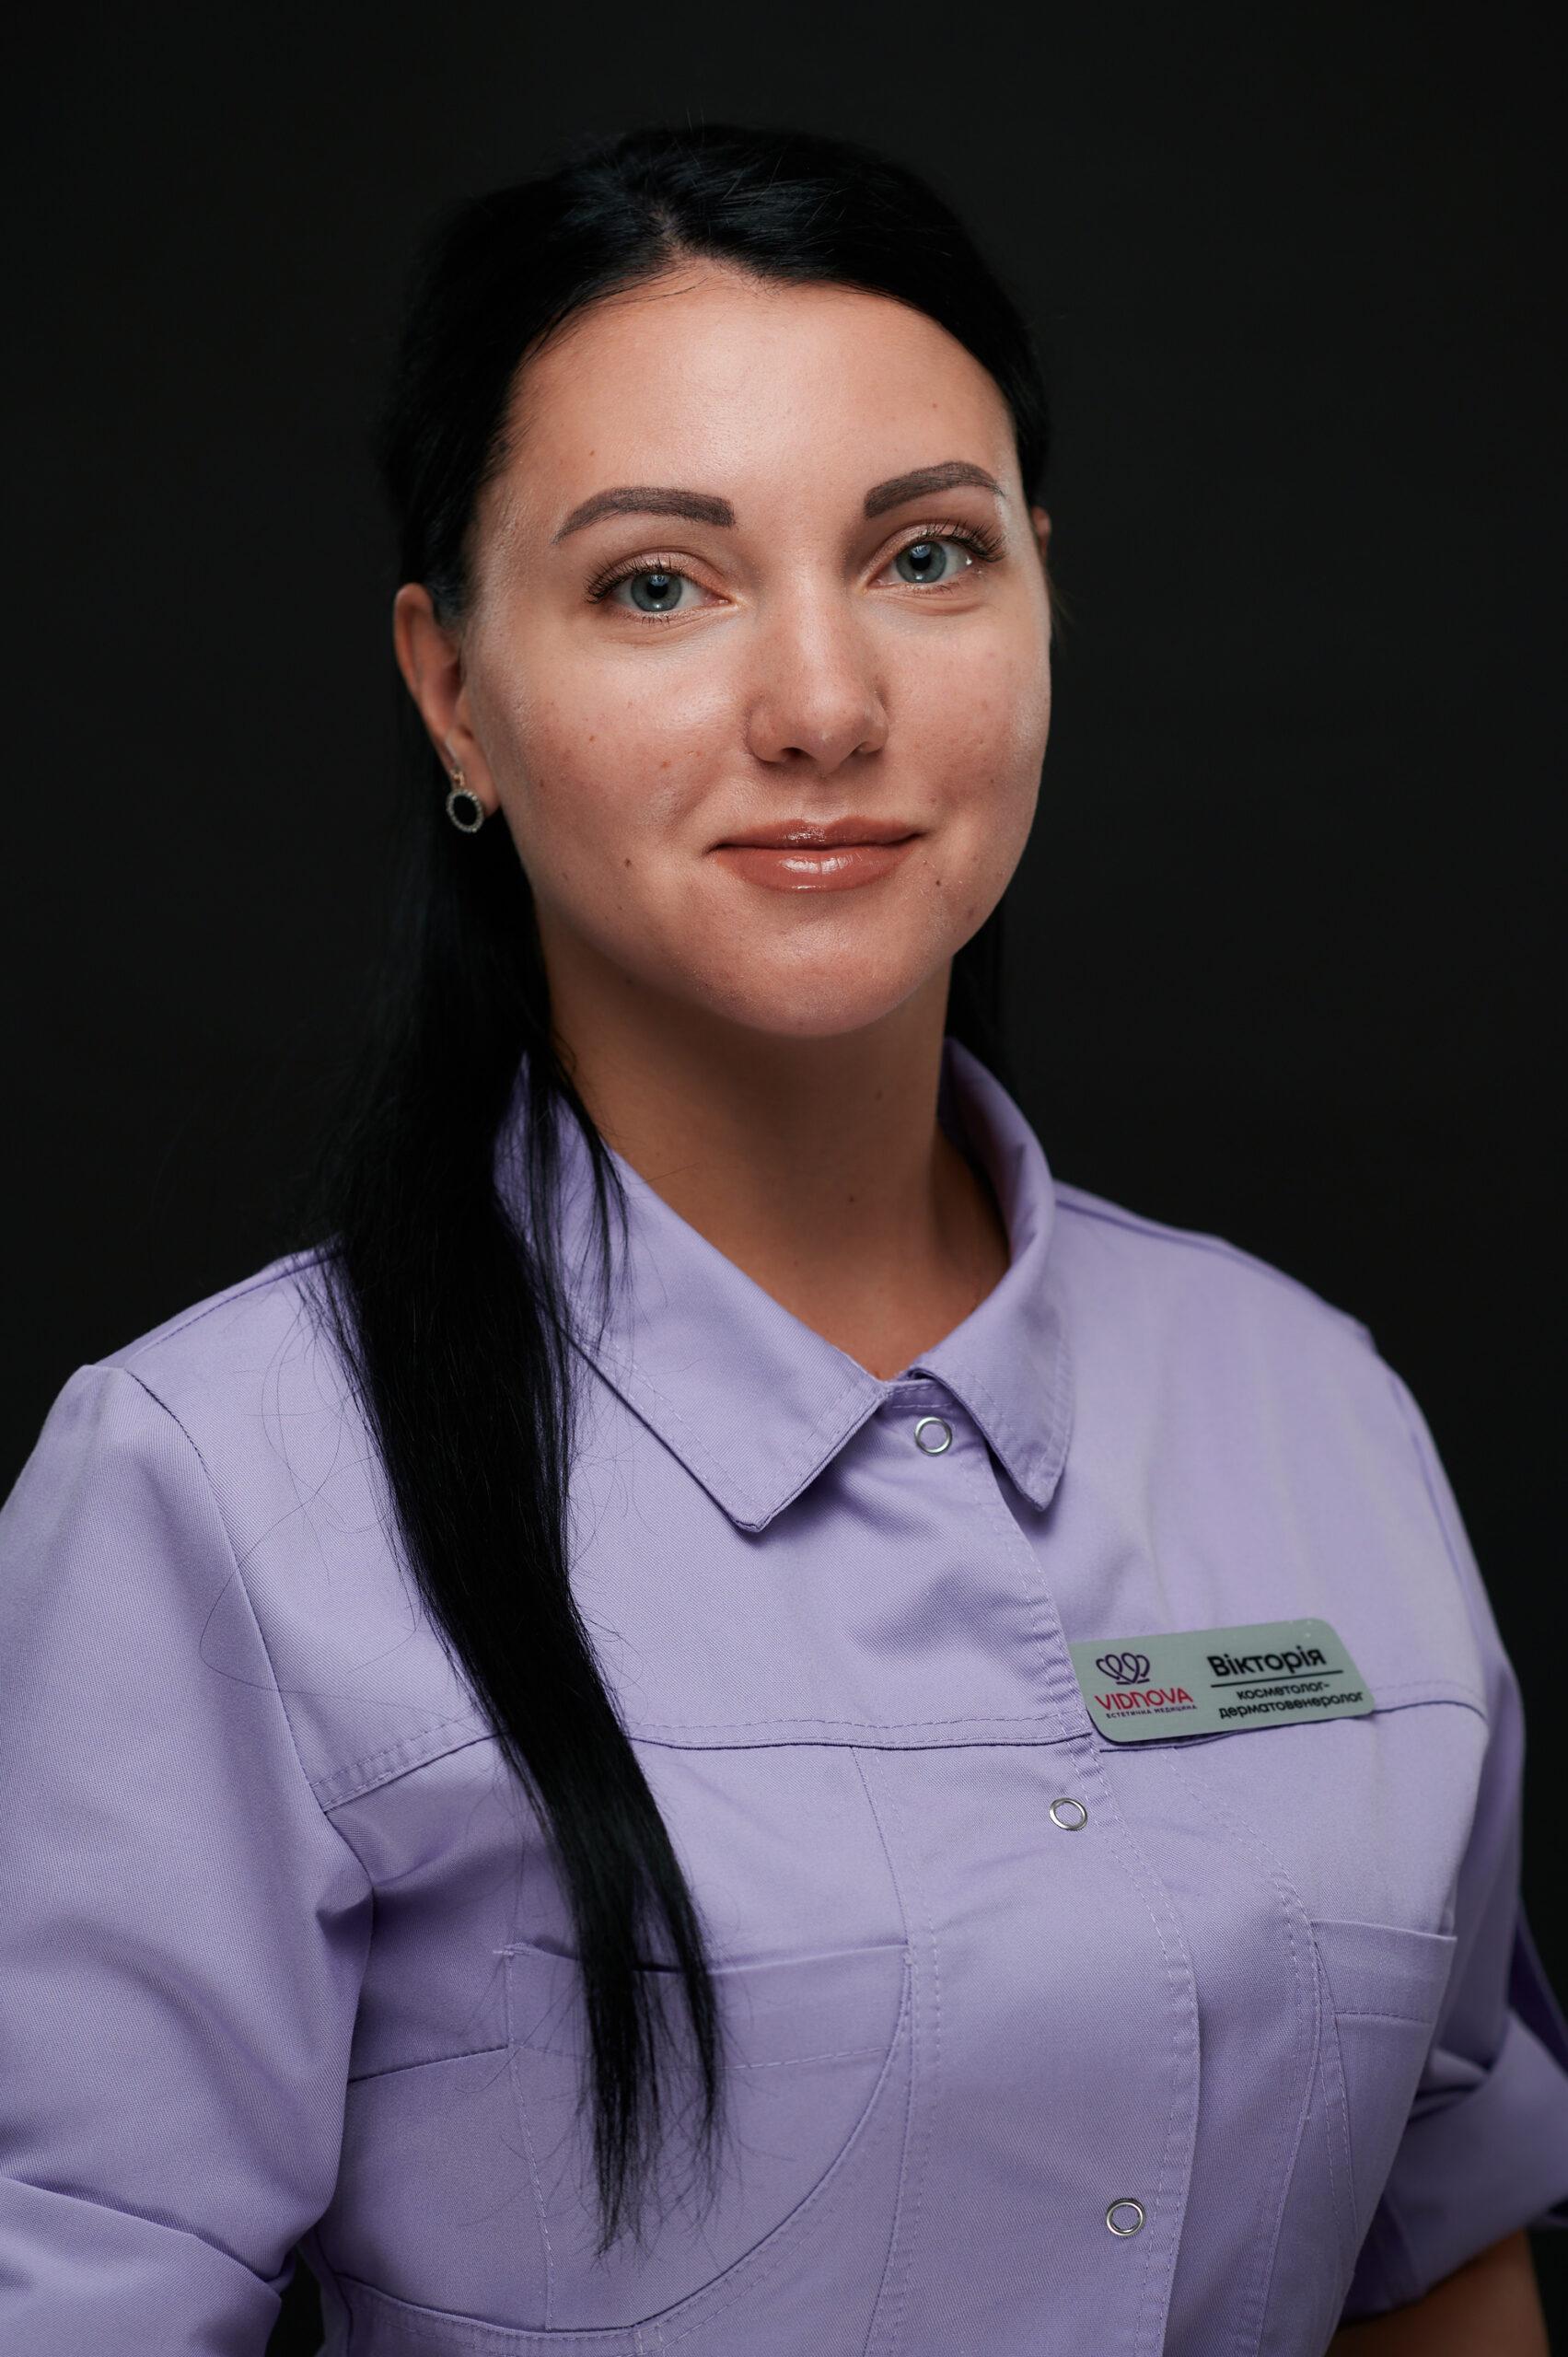 Берегулько Виктория Евгеньева - клиника Vidnova